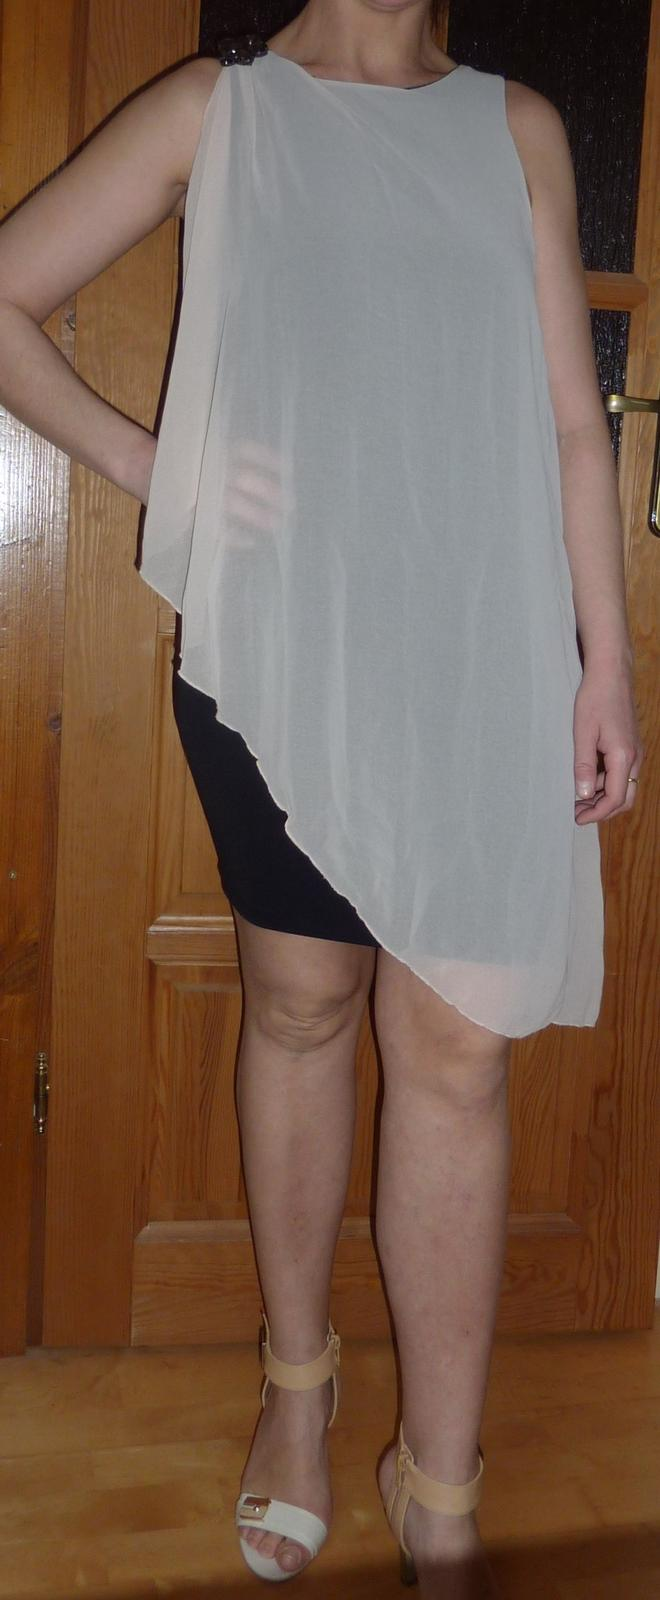 šik talianske šaty - Obrázok č. 2